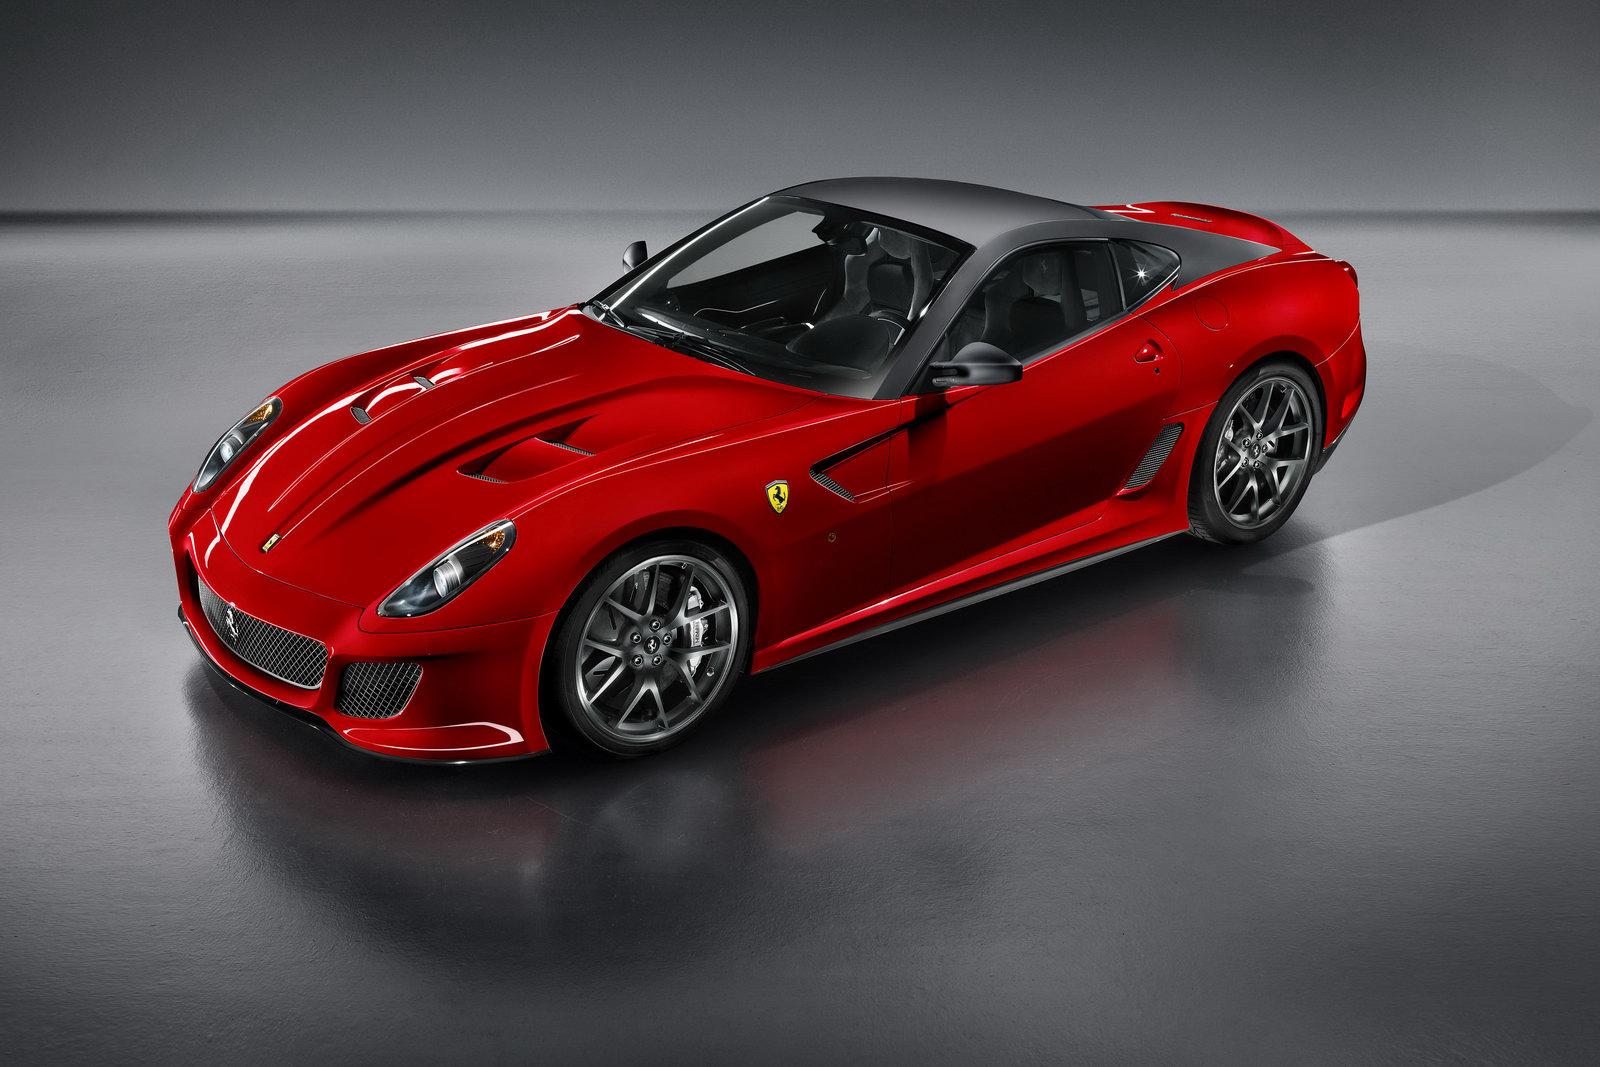 http://2.bp.blogspot.com/_FoXyvaPSnVk/S73ueBcKMFI/AAAAAAACue0/FkoMN-Ec1OA/s1600/Ferrari-599-GTO-1.jpg